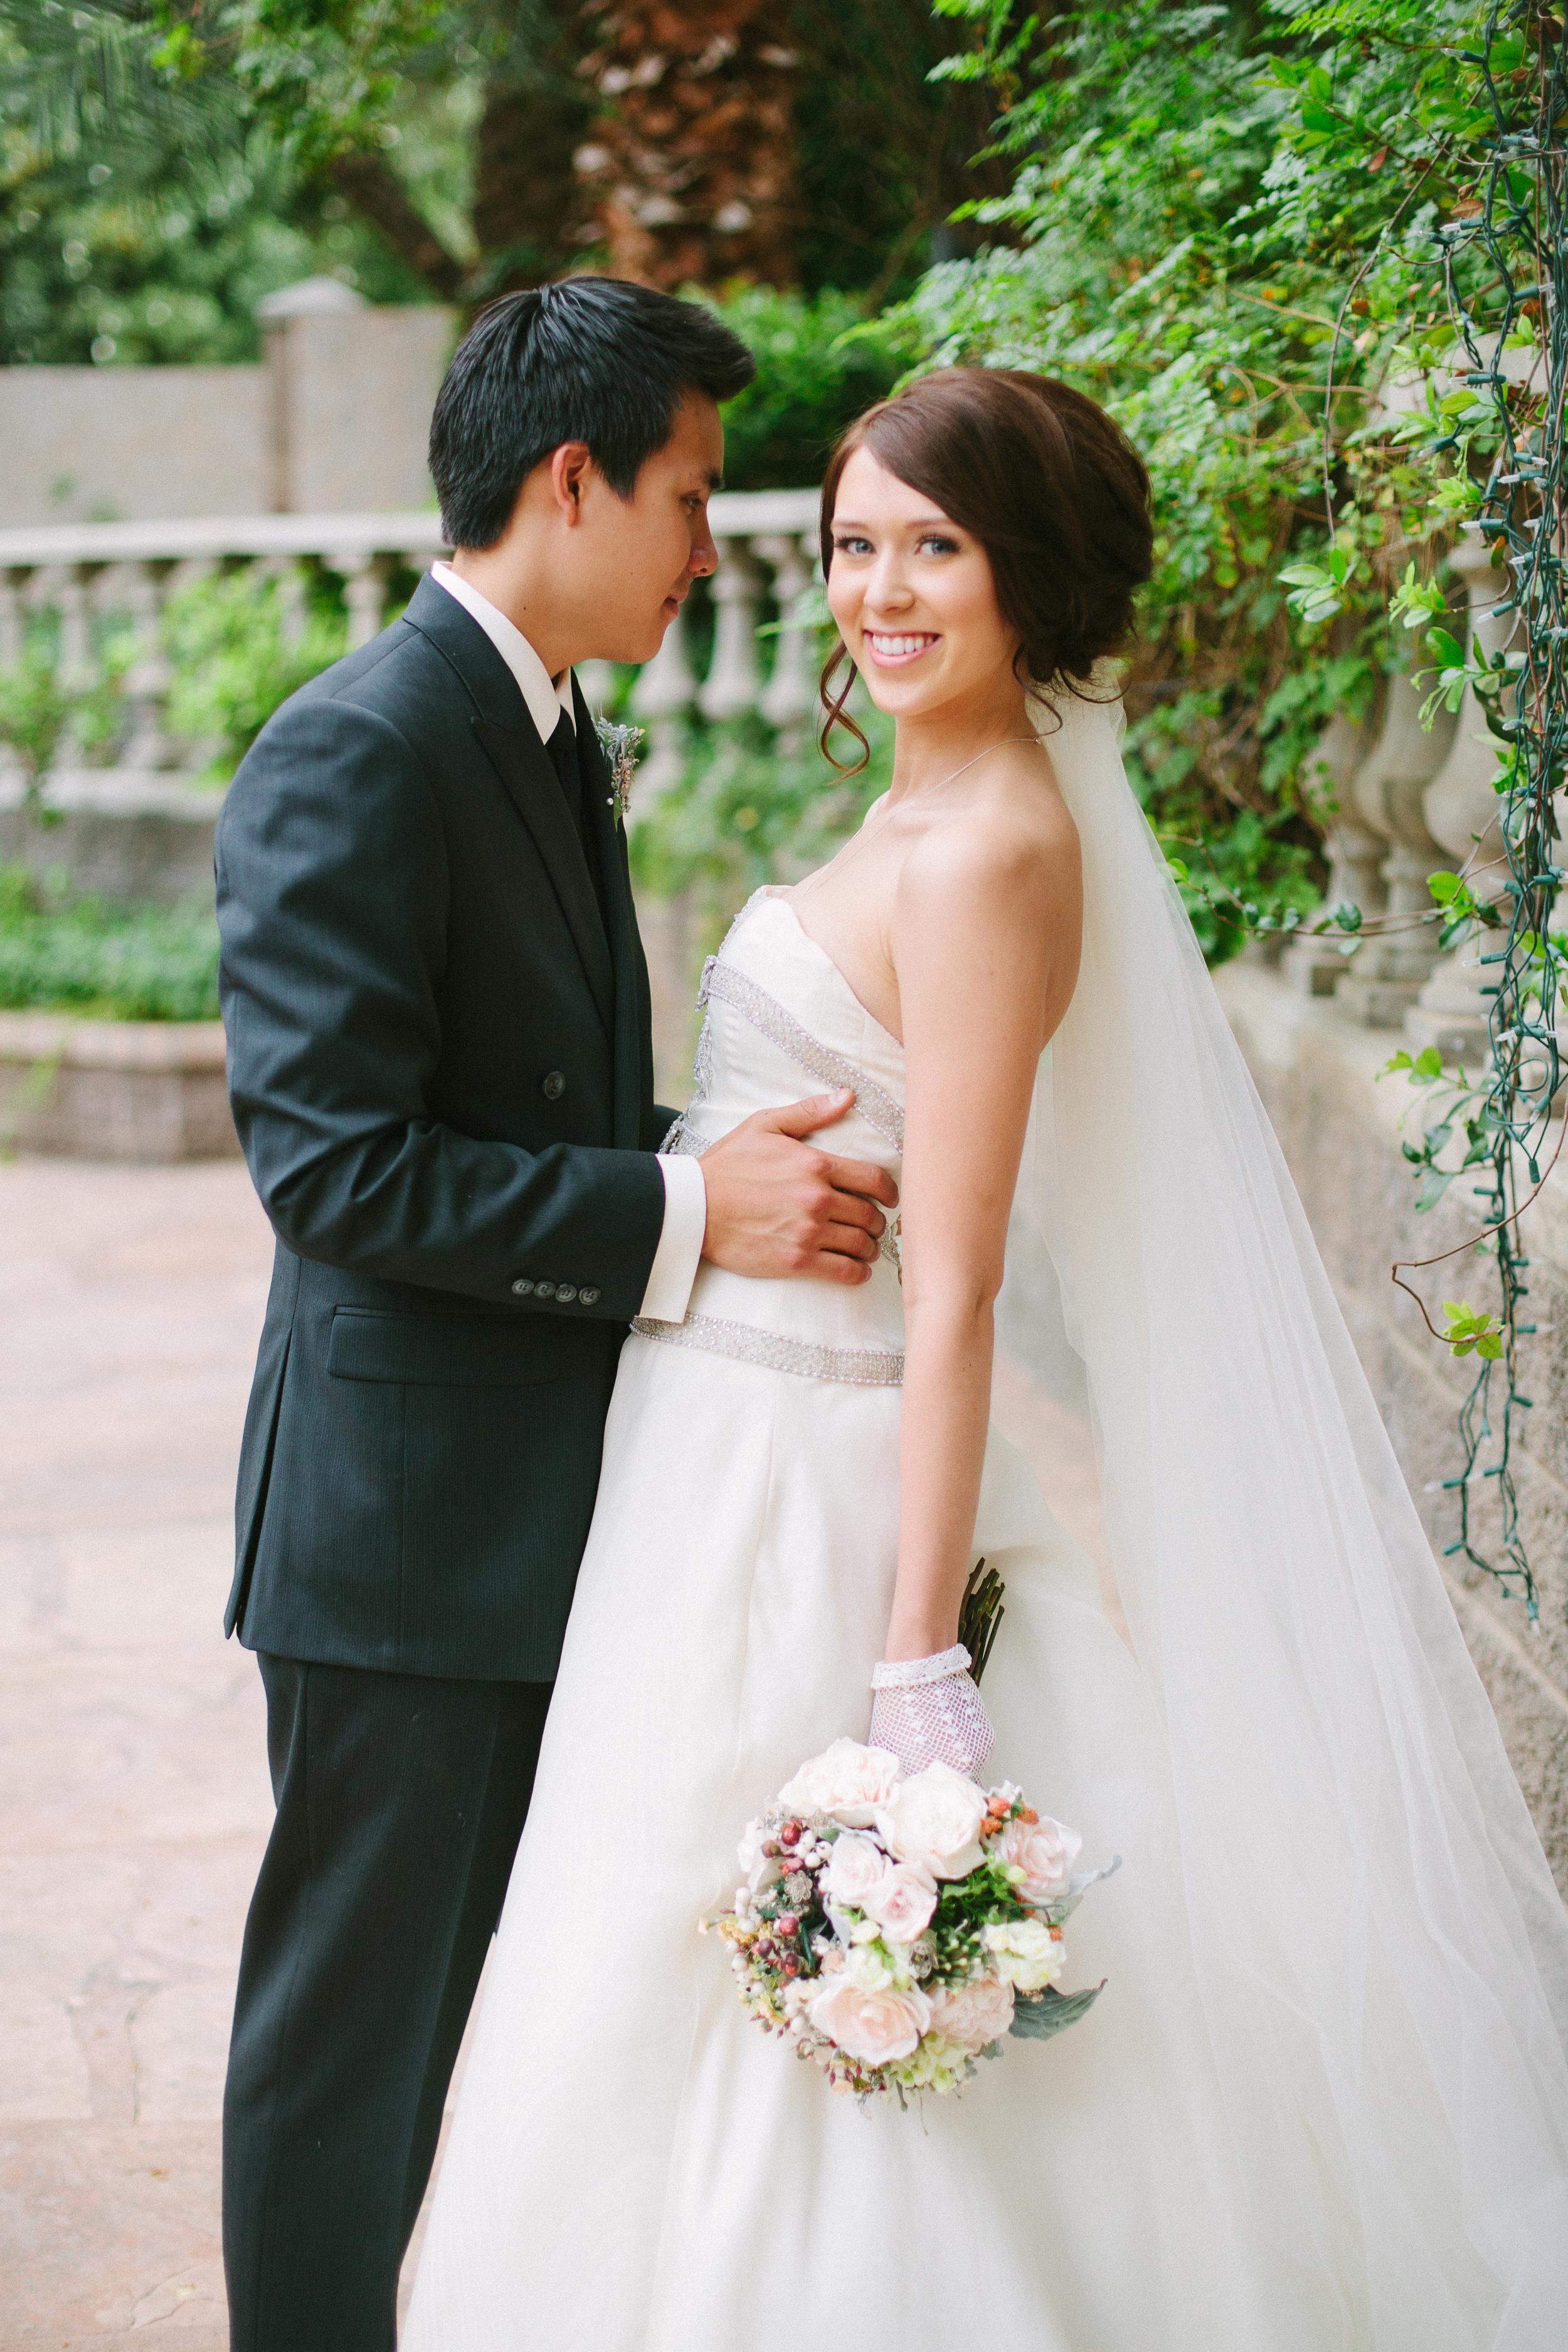 andrew-mashaida-wedding-4751.jpg